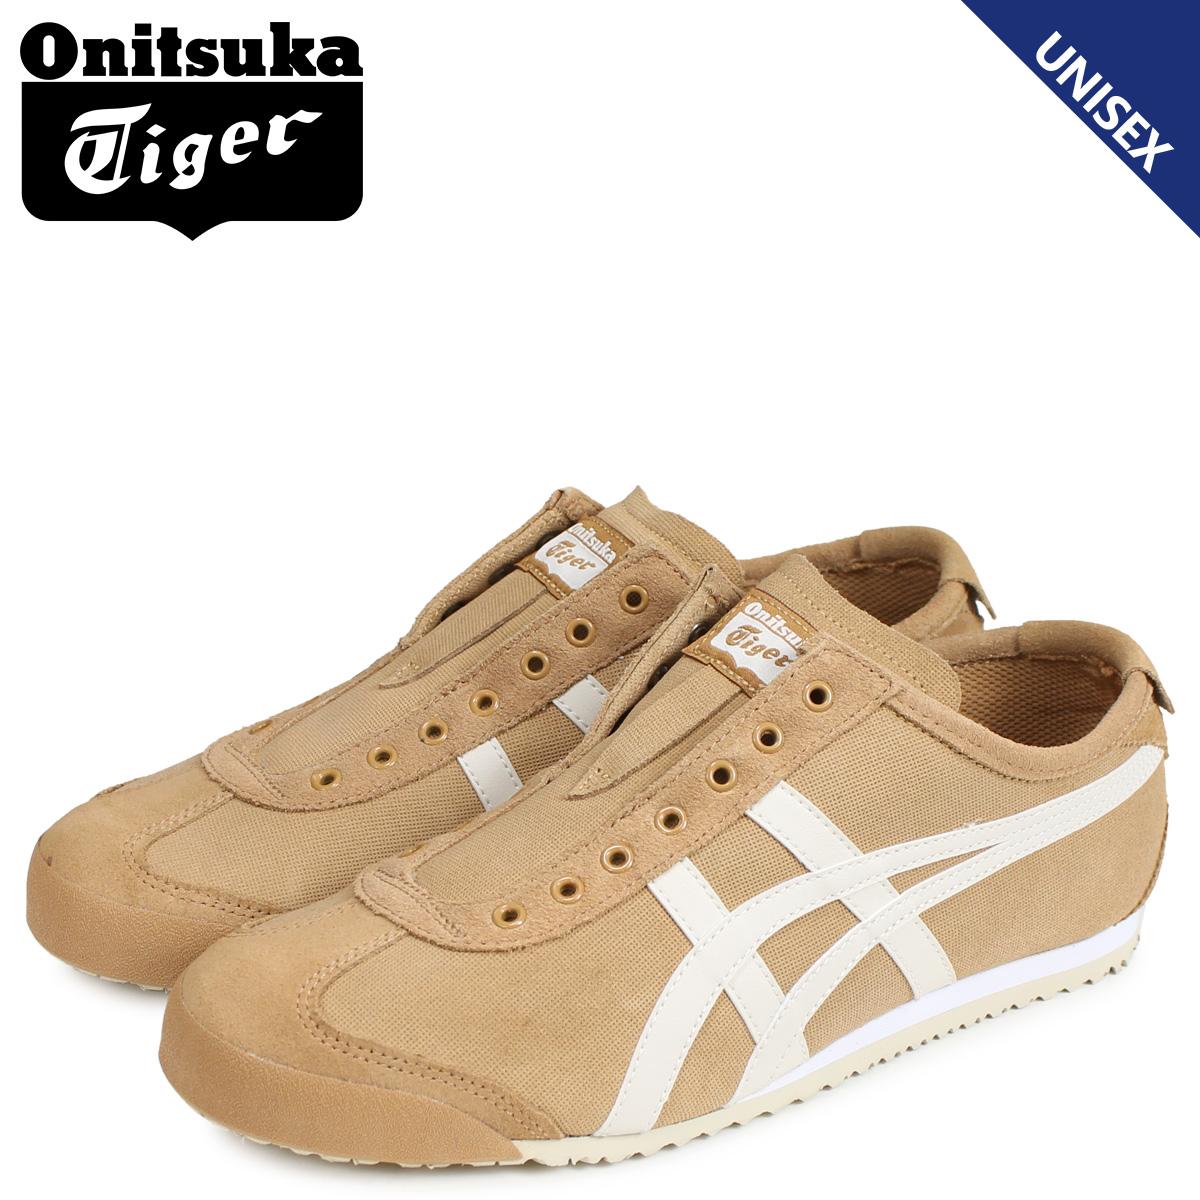 onitsuka tiger mexico 66 shoes online oficial website ks